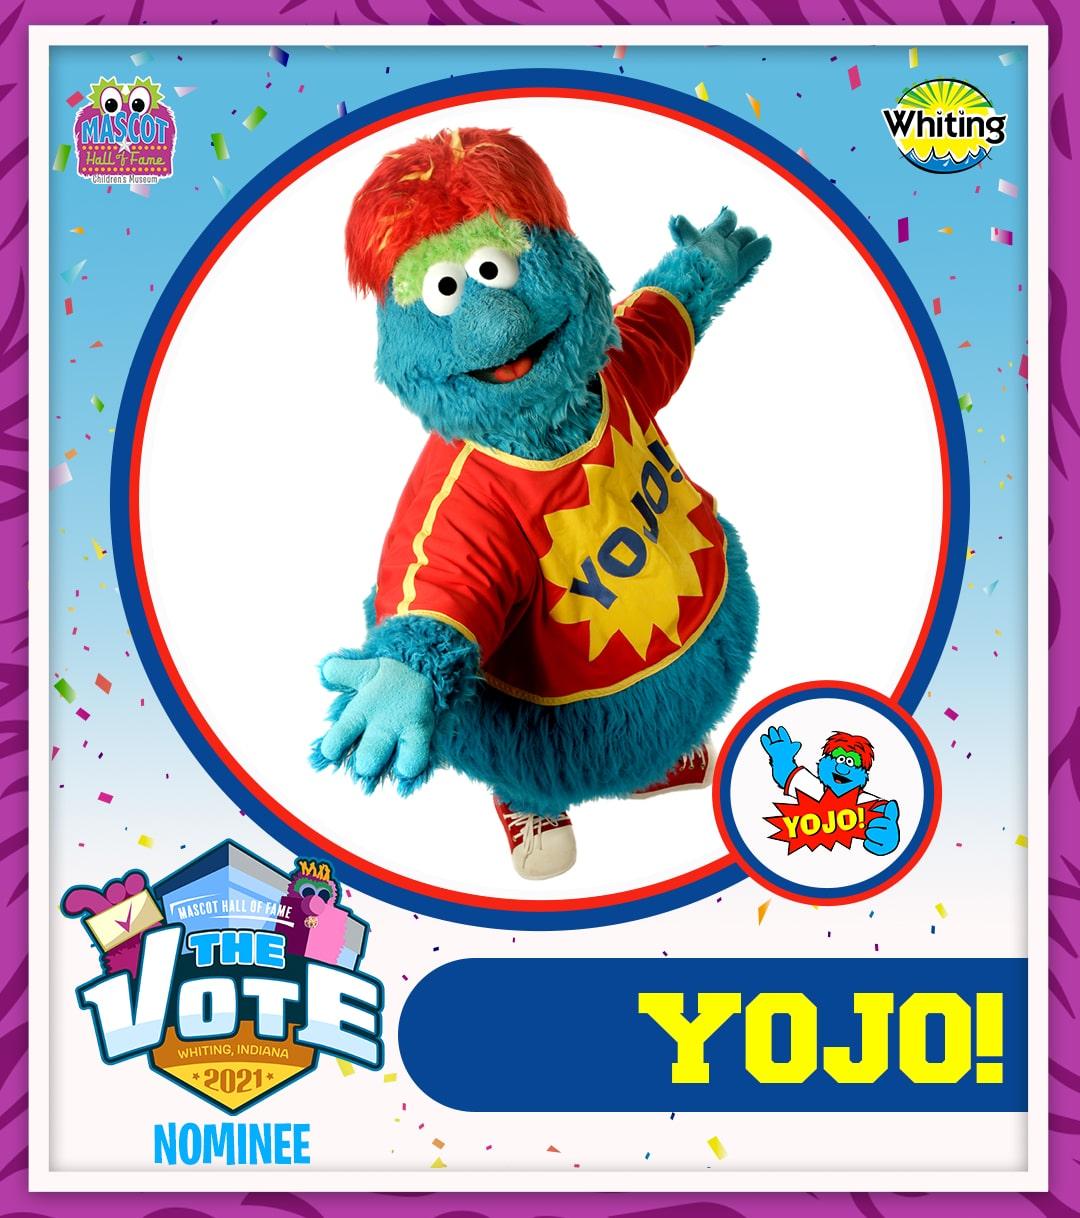 Yojo photo